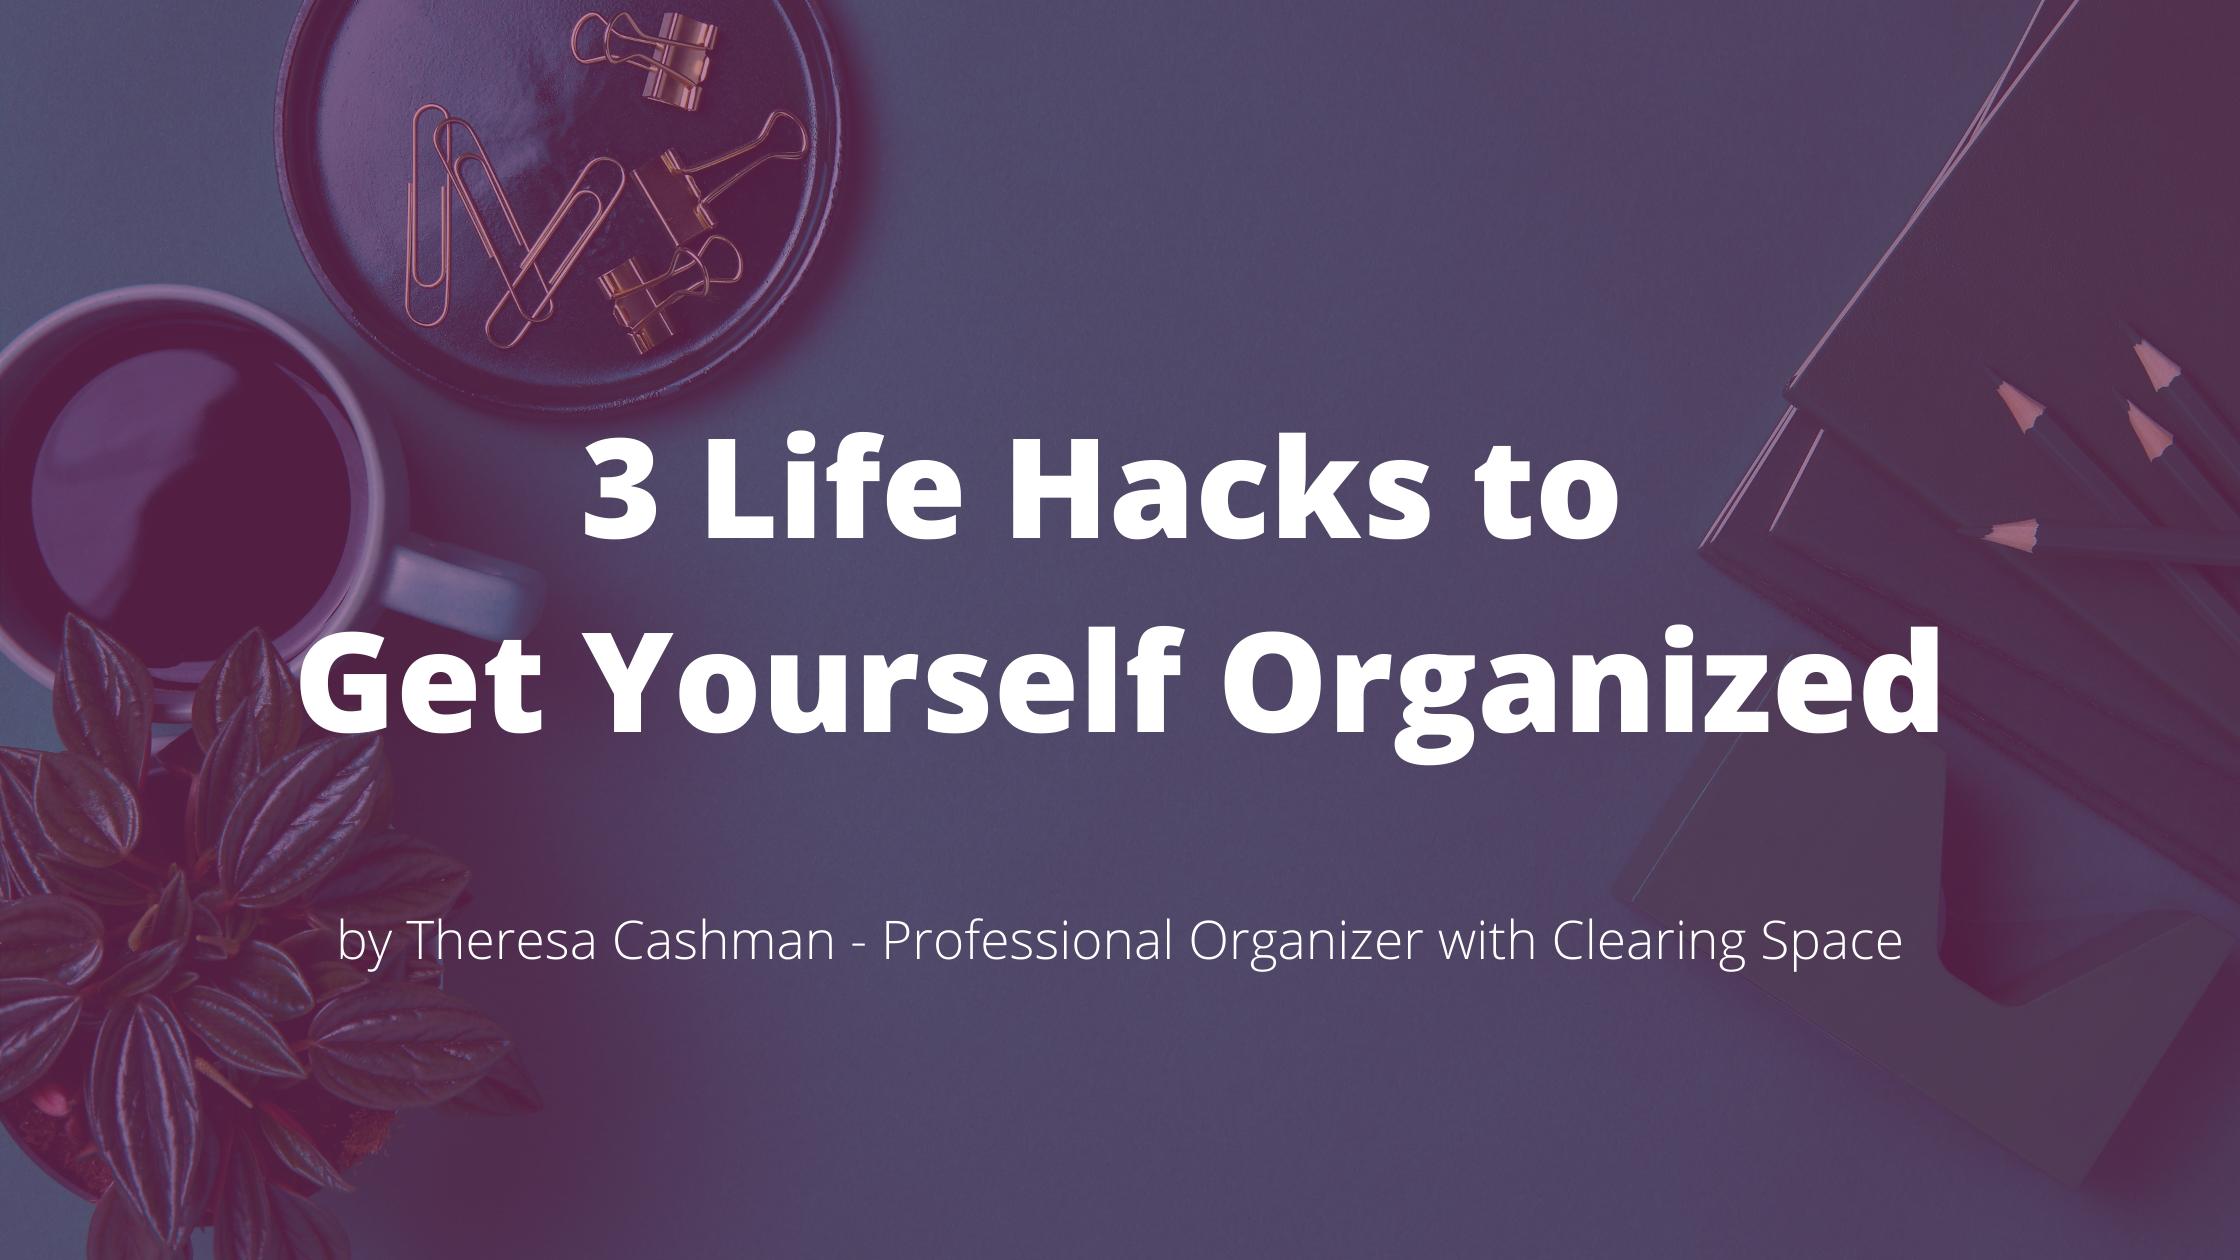 3 life hacks to get organized